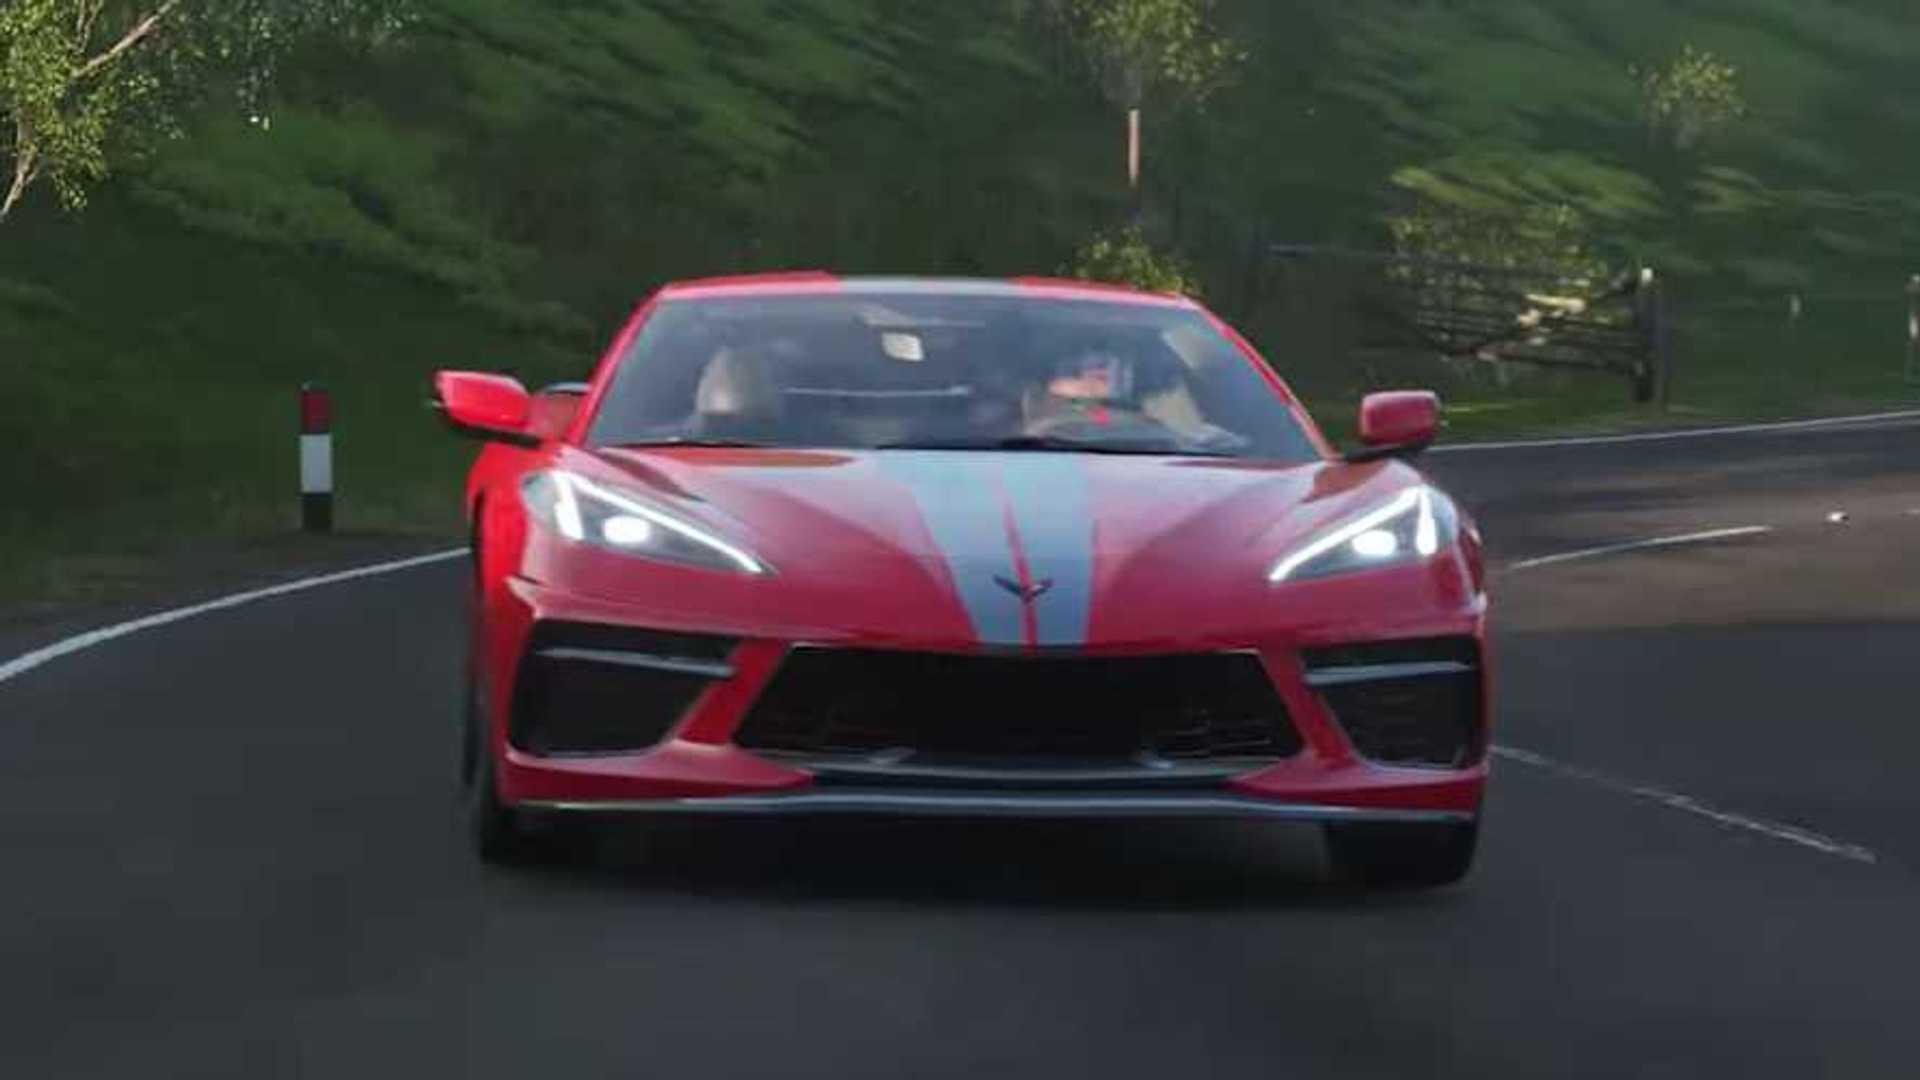 Chevy Corvette C8 появится в Forza Horizon 4 14 января